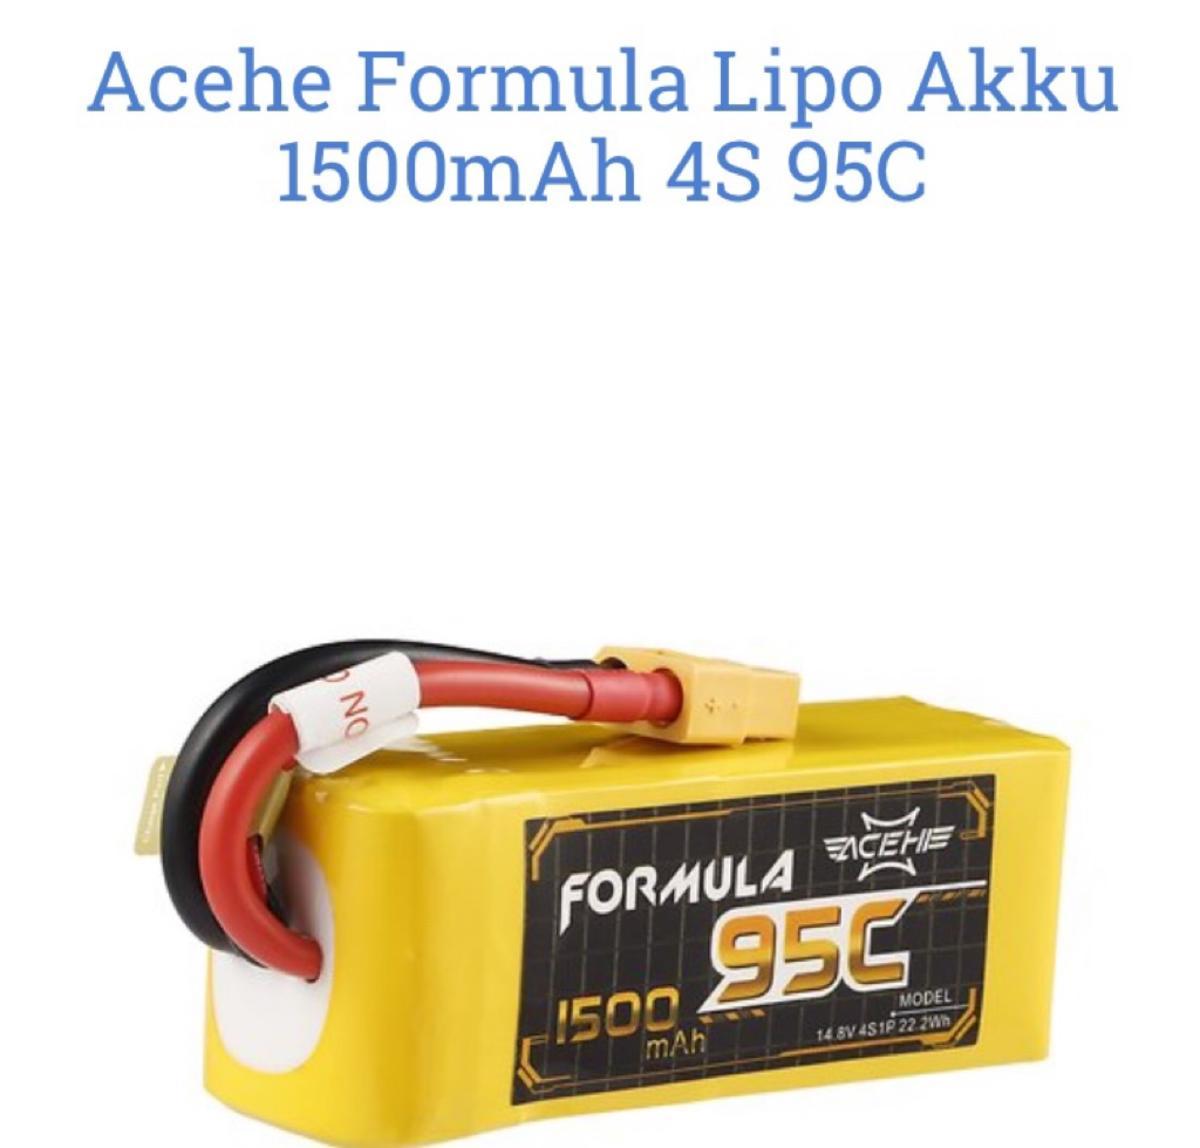 Acehe LiPo